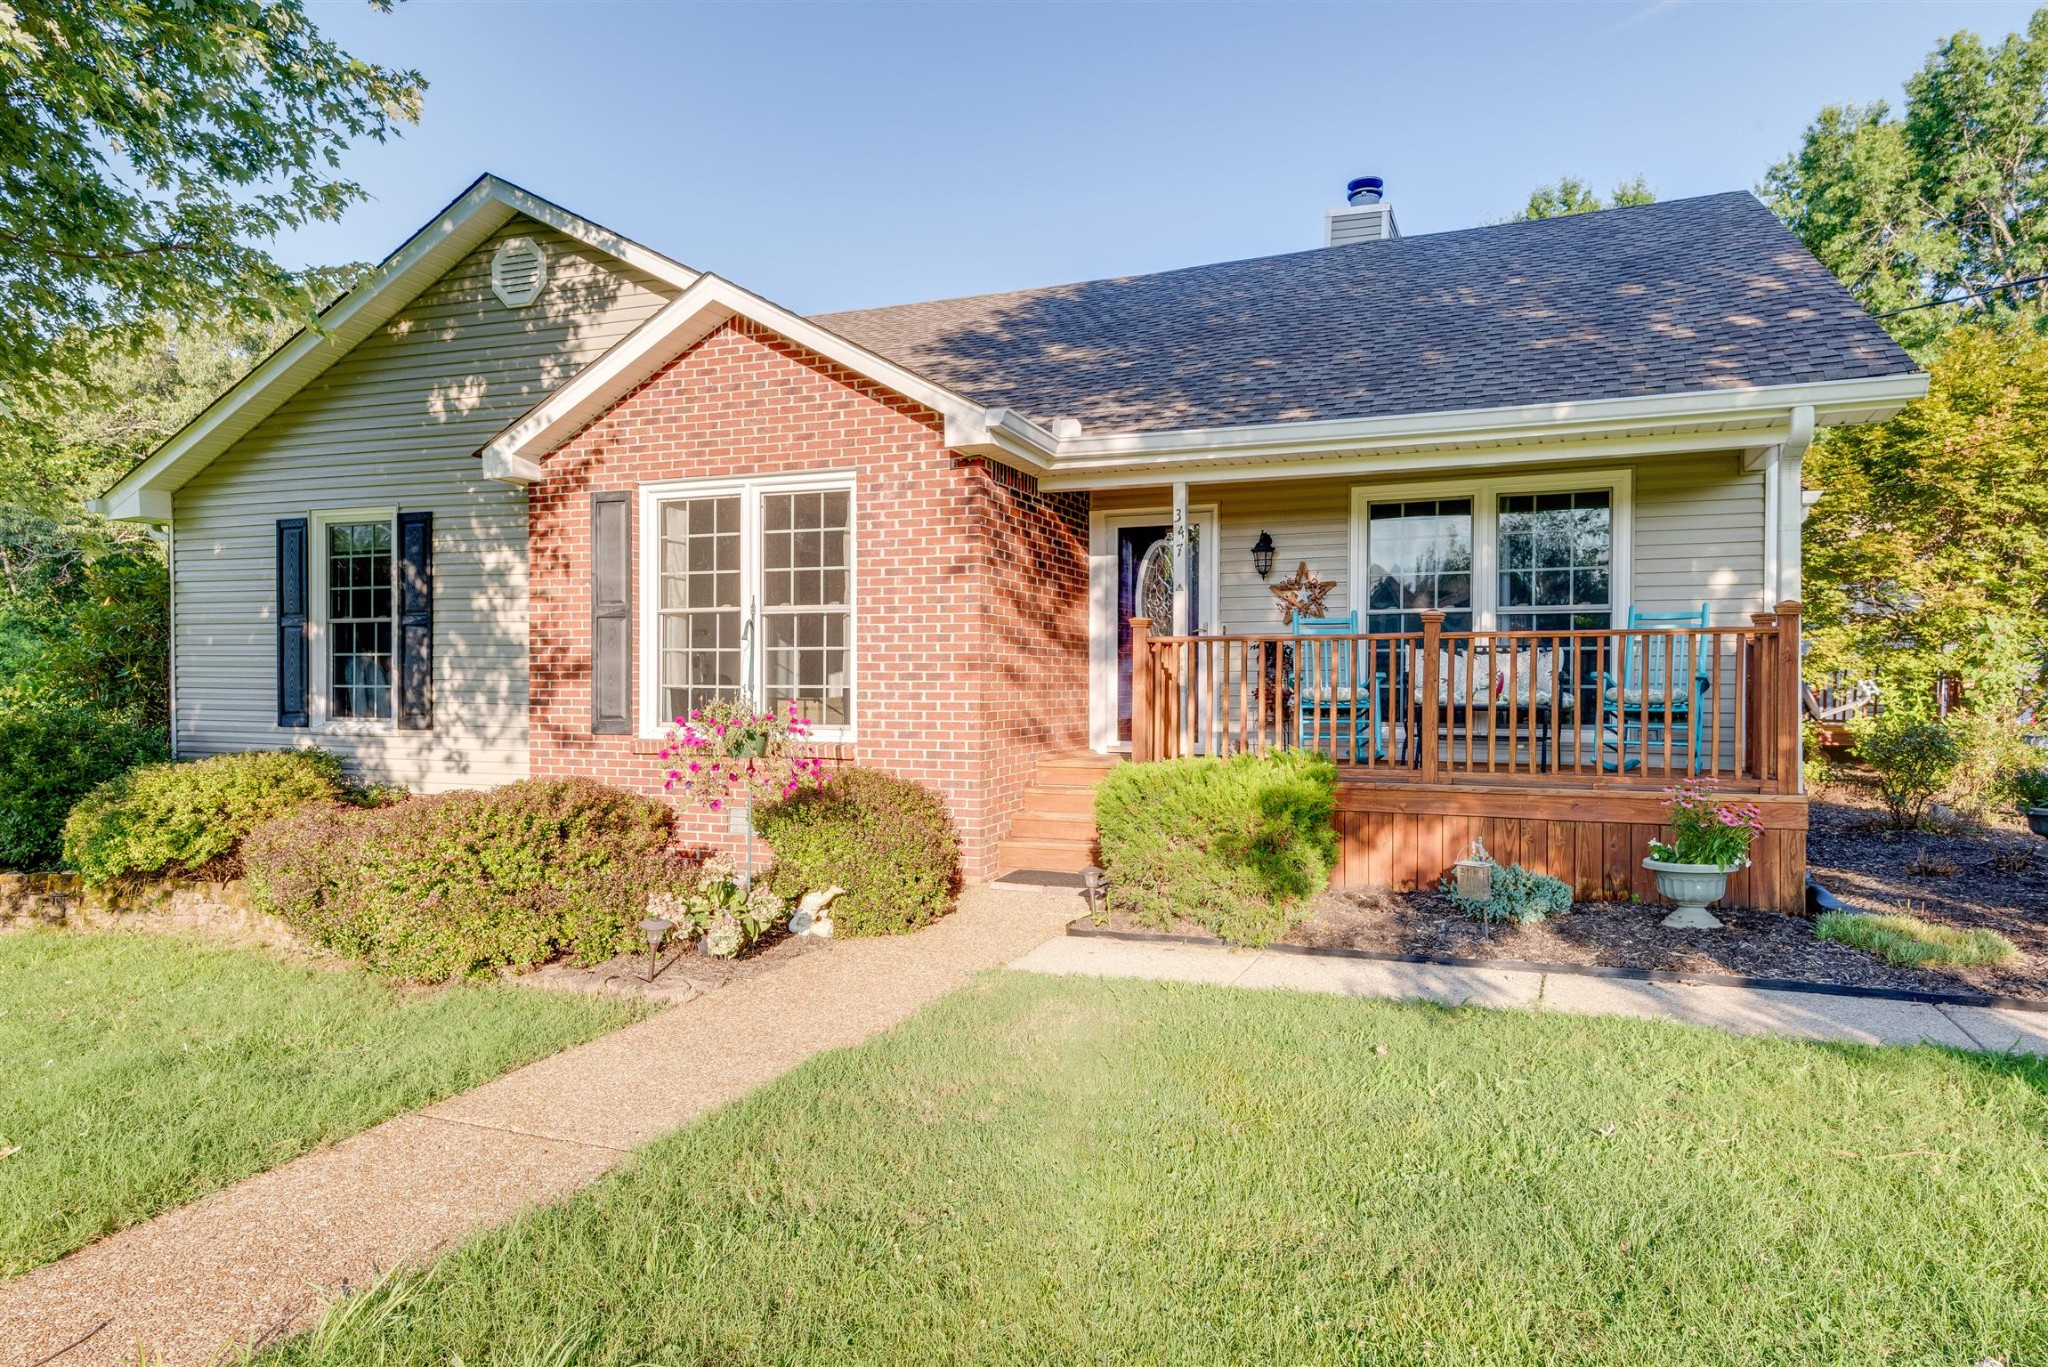 347 Arrowhead Ct, Kingston Springs, TN 37082 - Kingston Springs, TN real estate listing